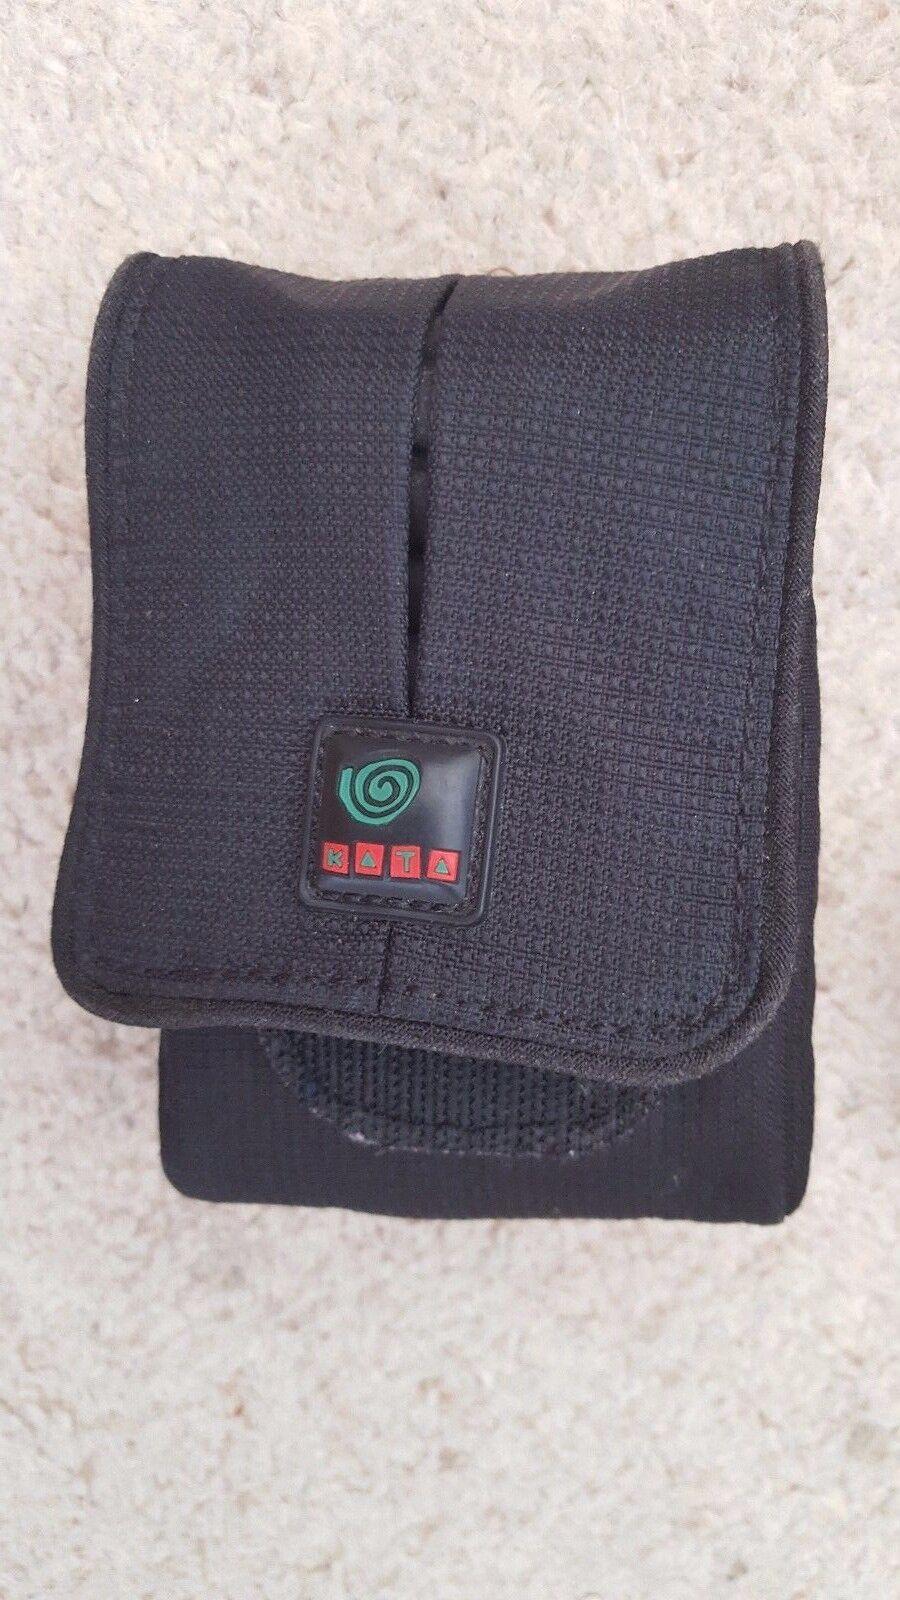 KATA DP-403 DPS Pouch Case for Compact Cameras